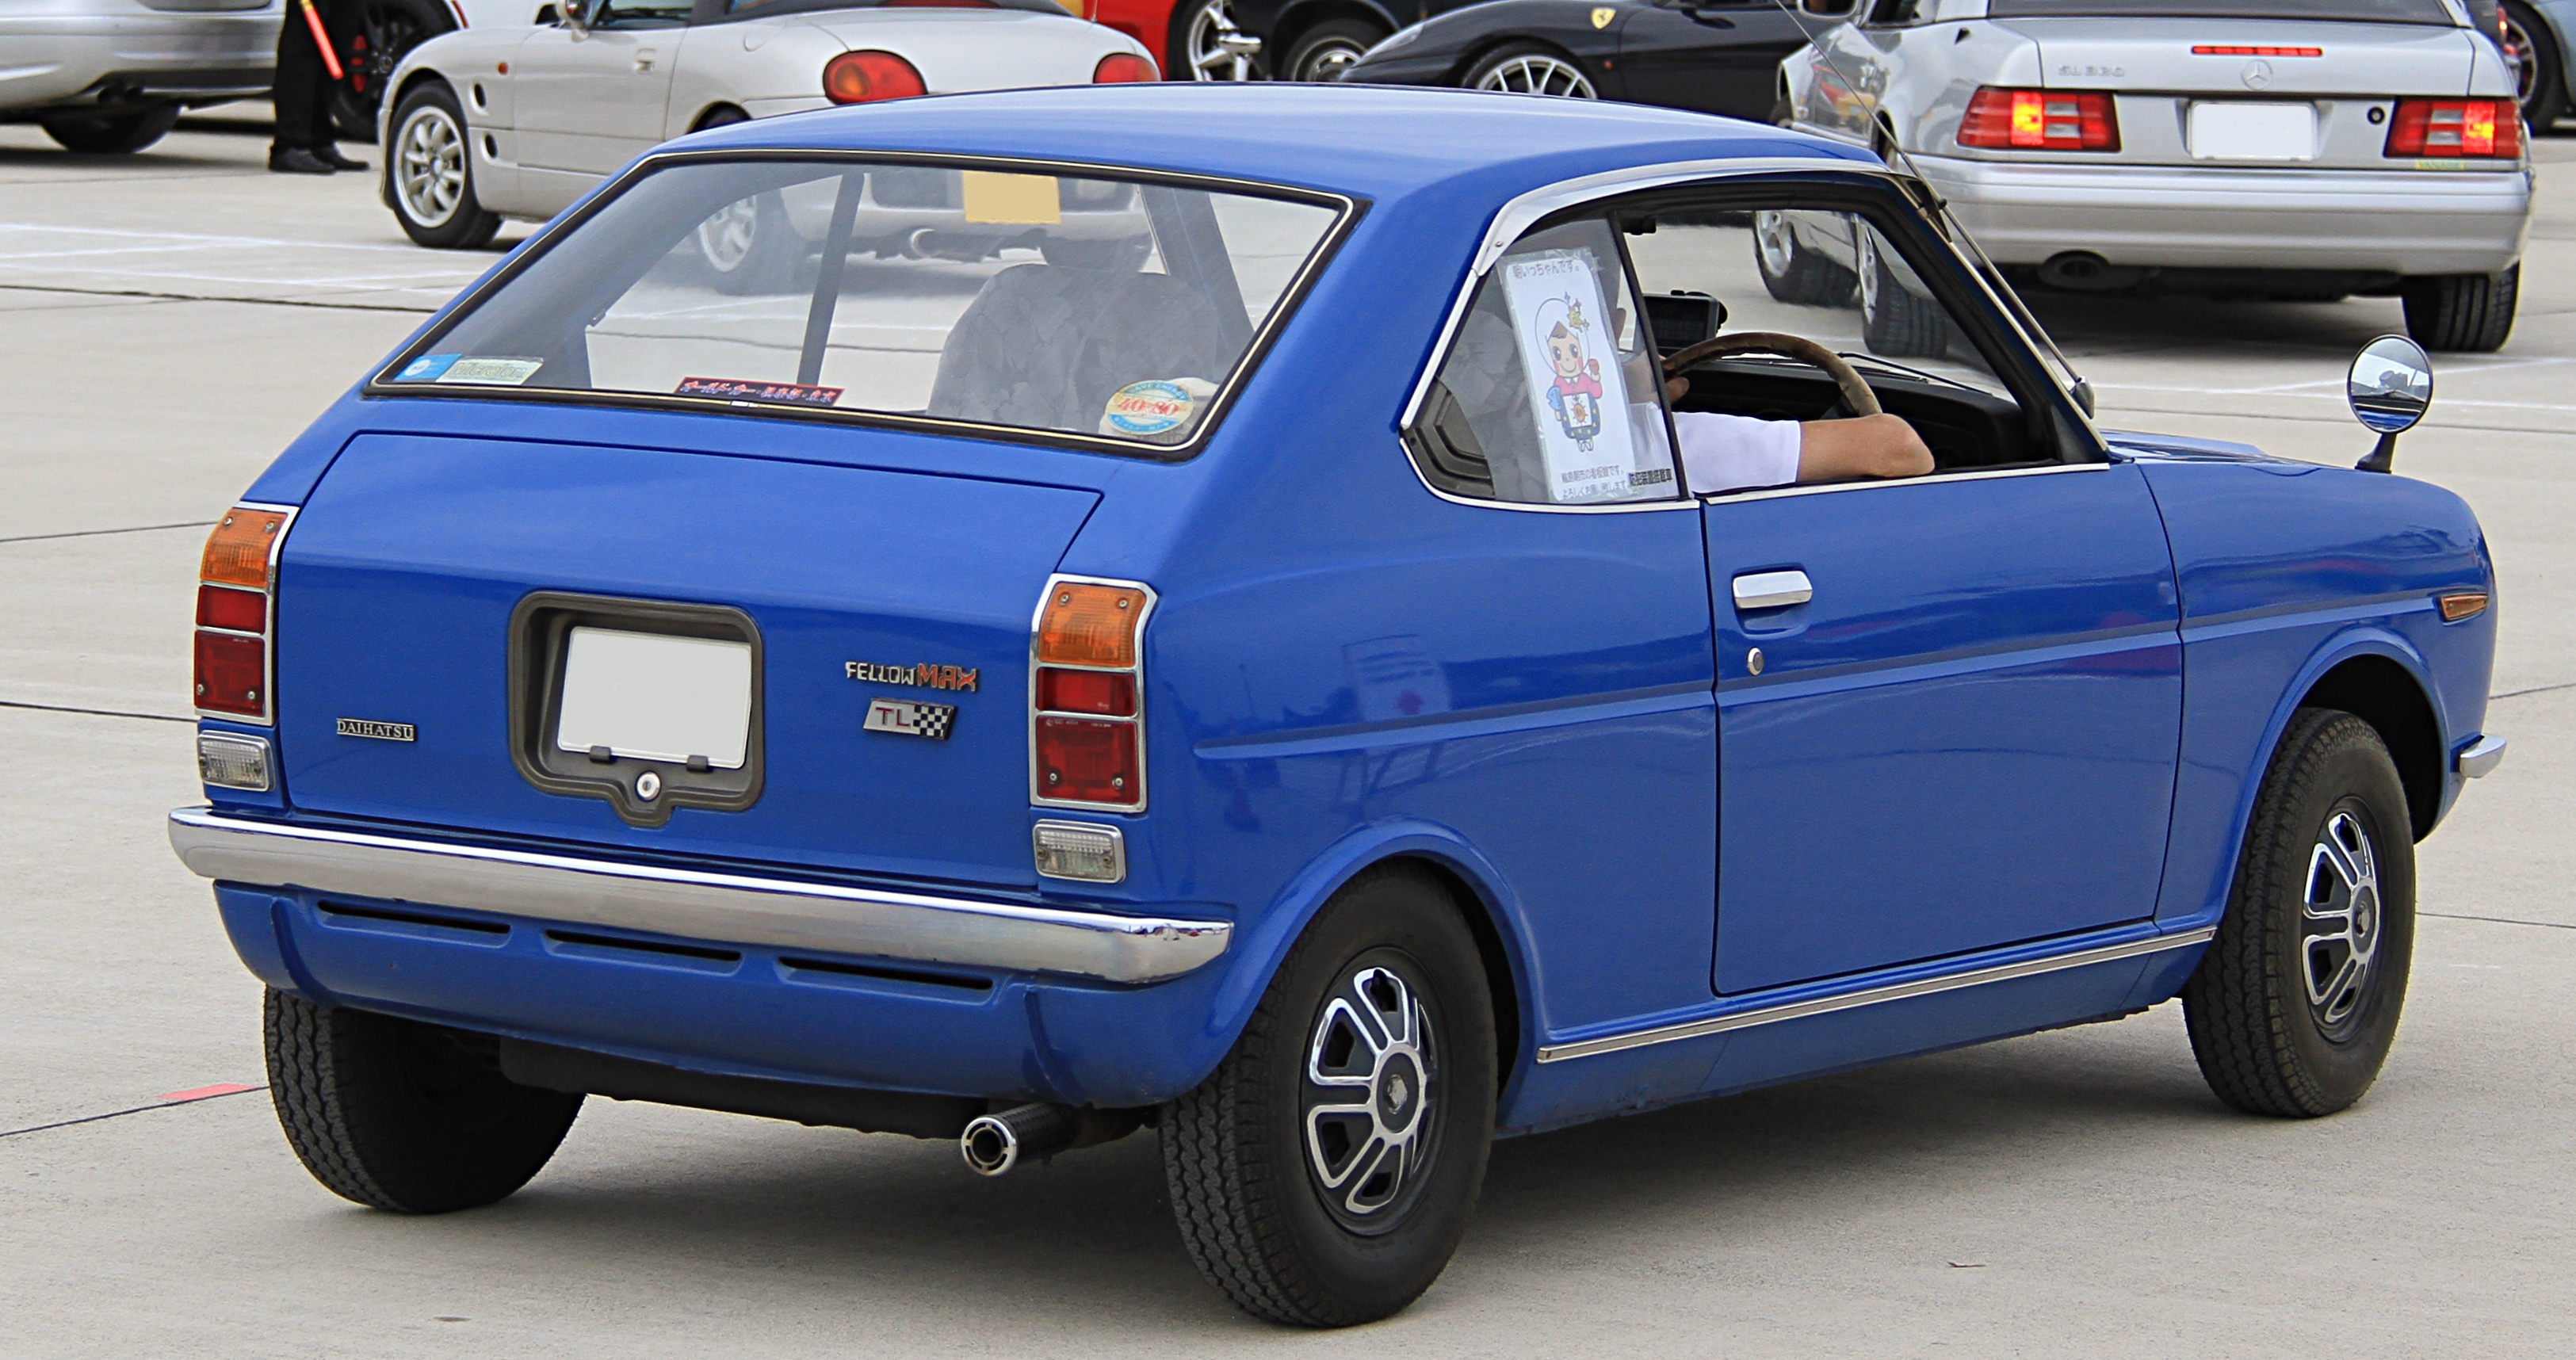 Daihatsu Fellow II (Max) 1970 - 1976 Coupe #4